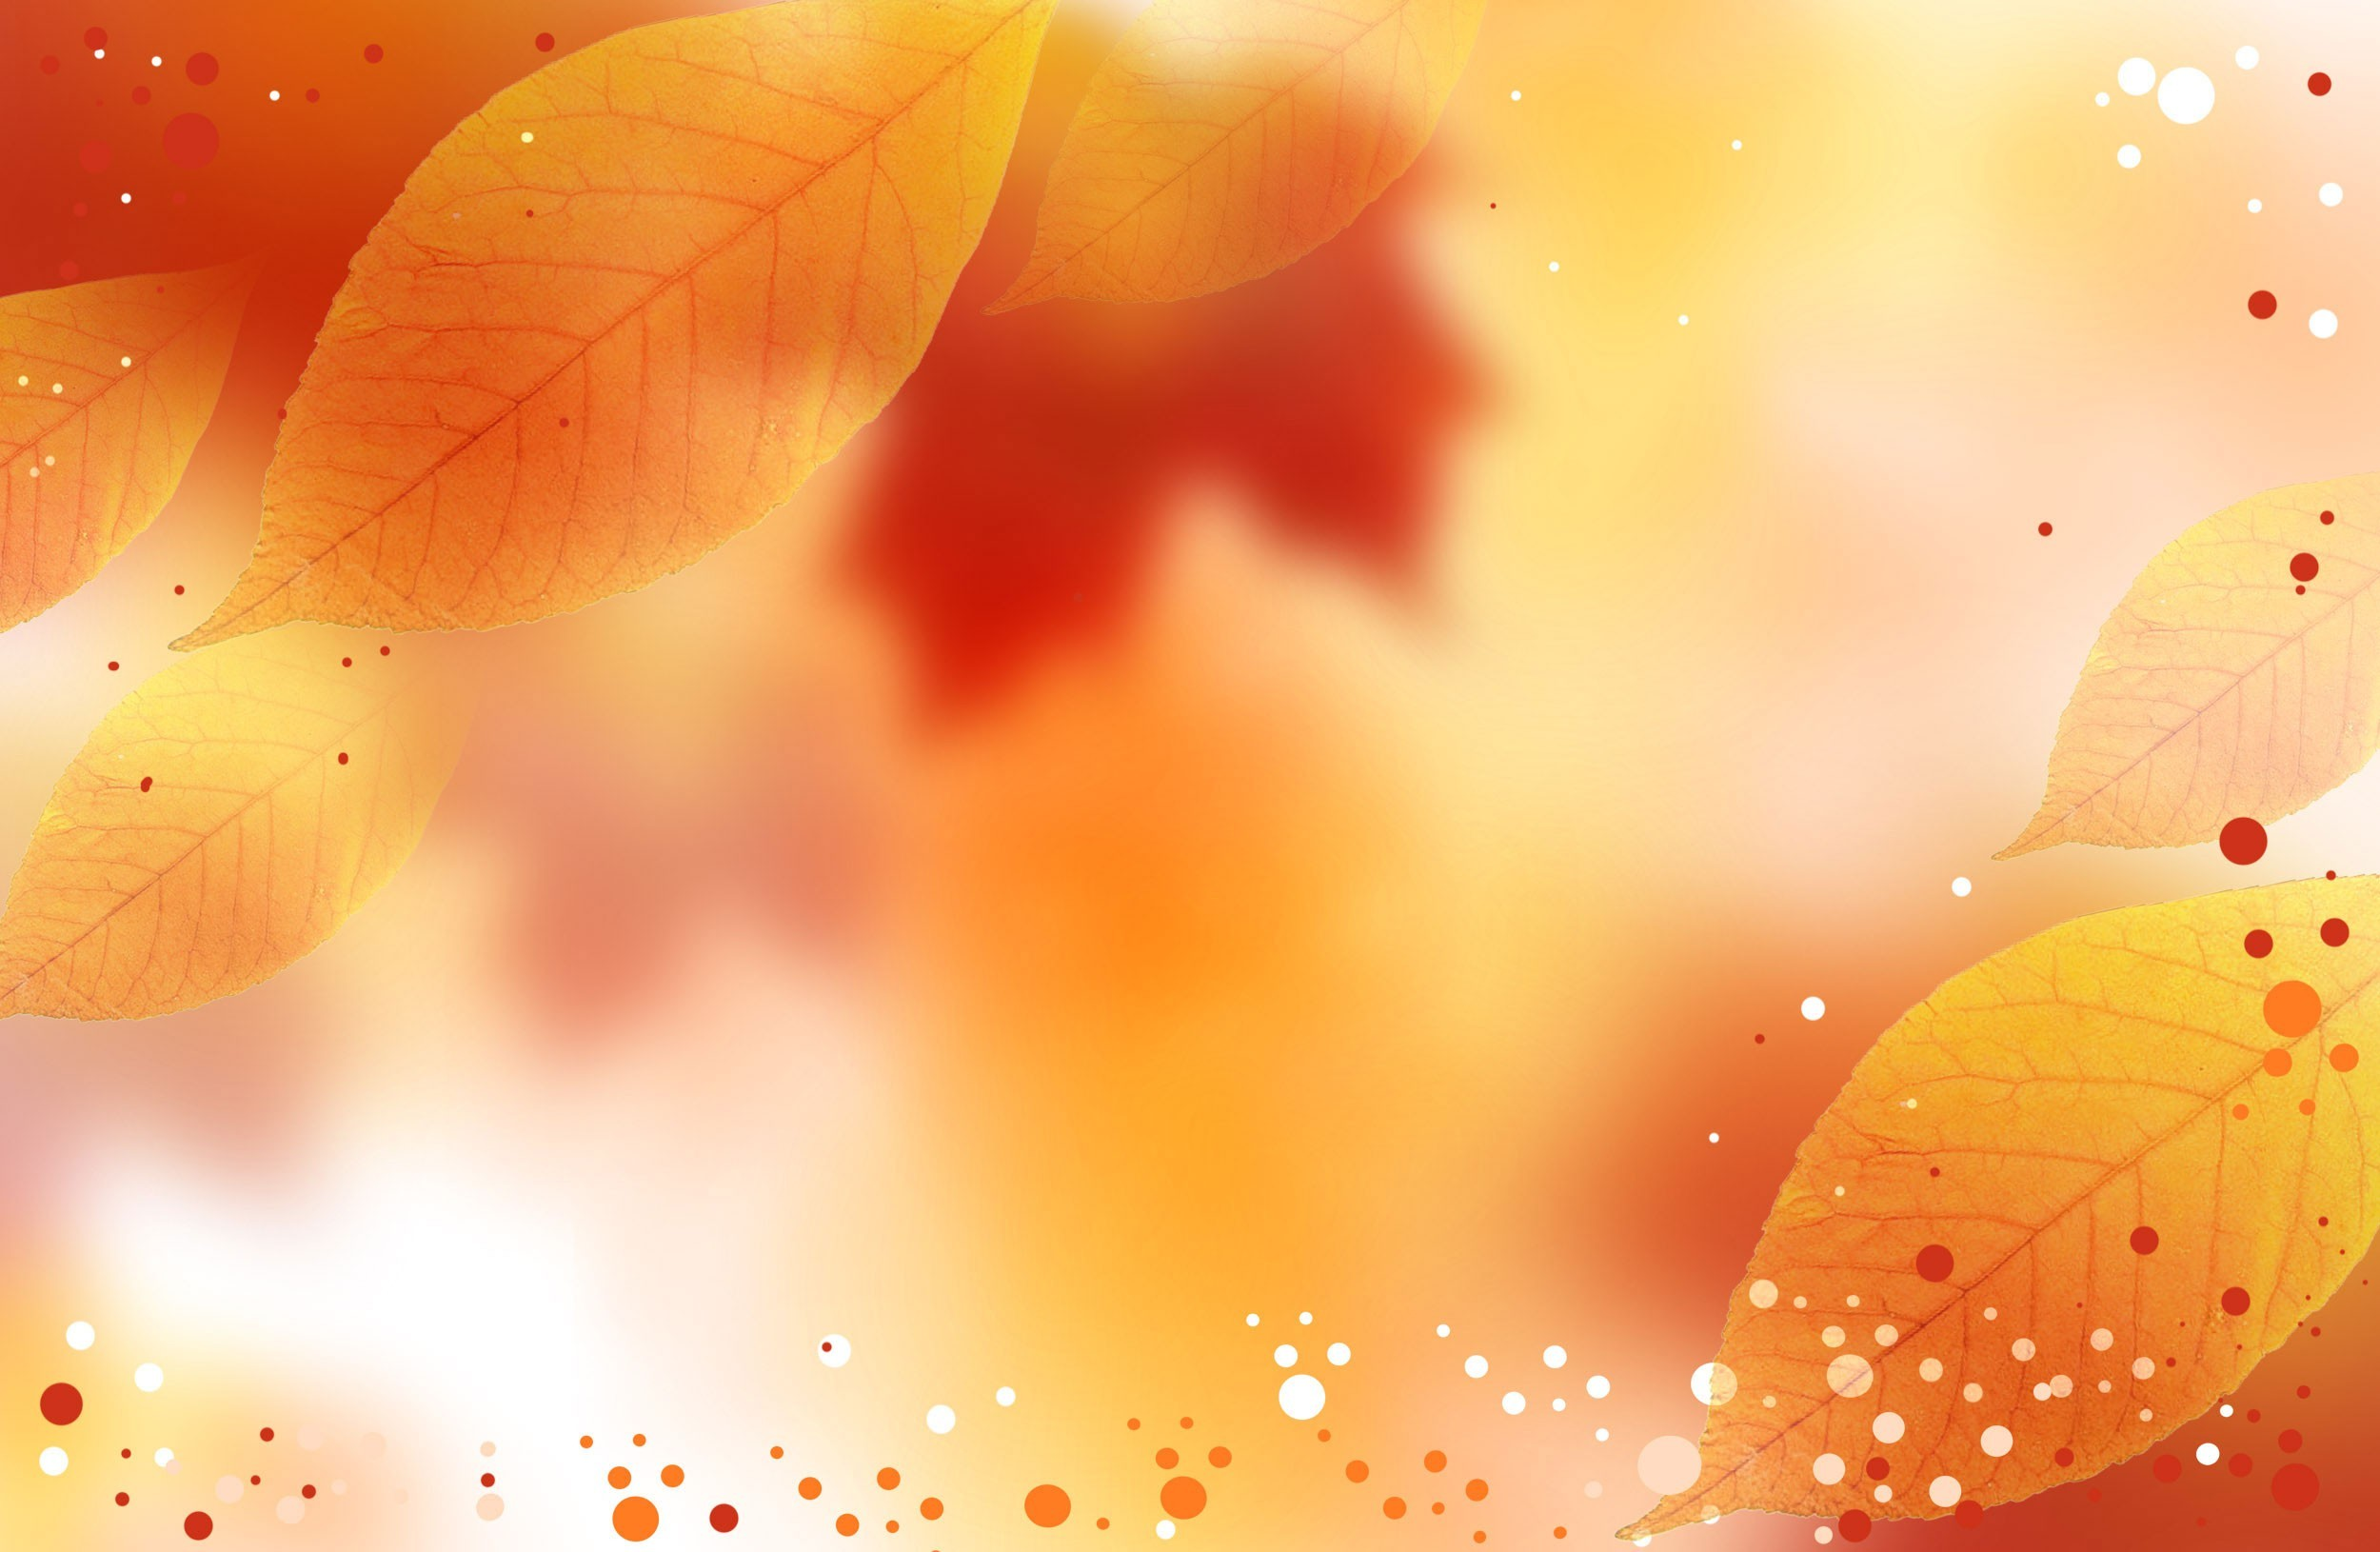 Fall-Background-Free-Desktop-8-High-Definition-Wallpapers-HD.jpeg » Fall- Background-Free-Desktop-8-High-Definition-Wallpapers-HD.jpeg